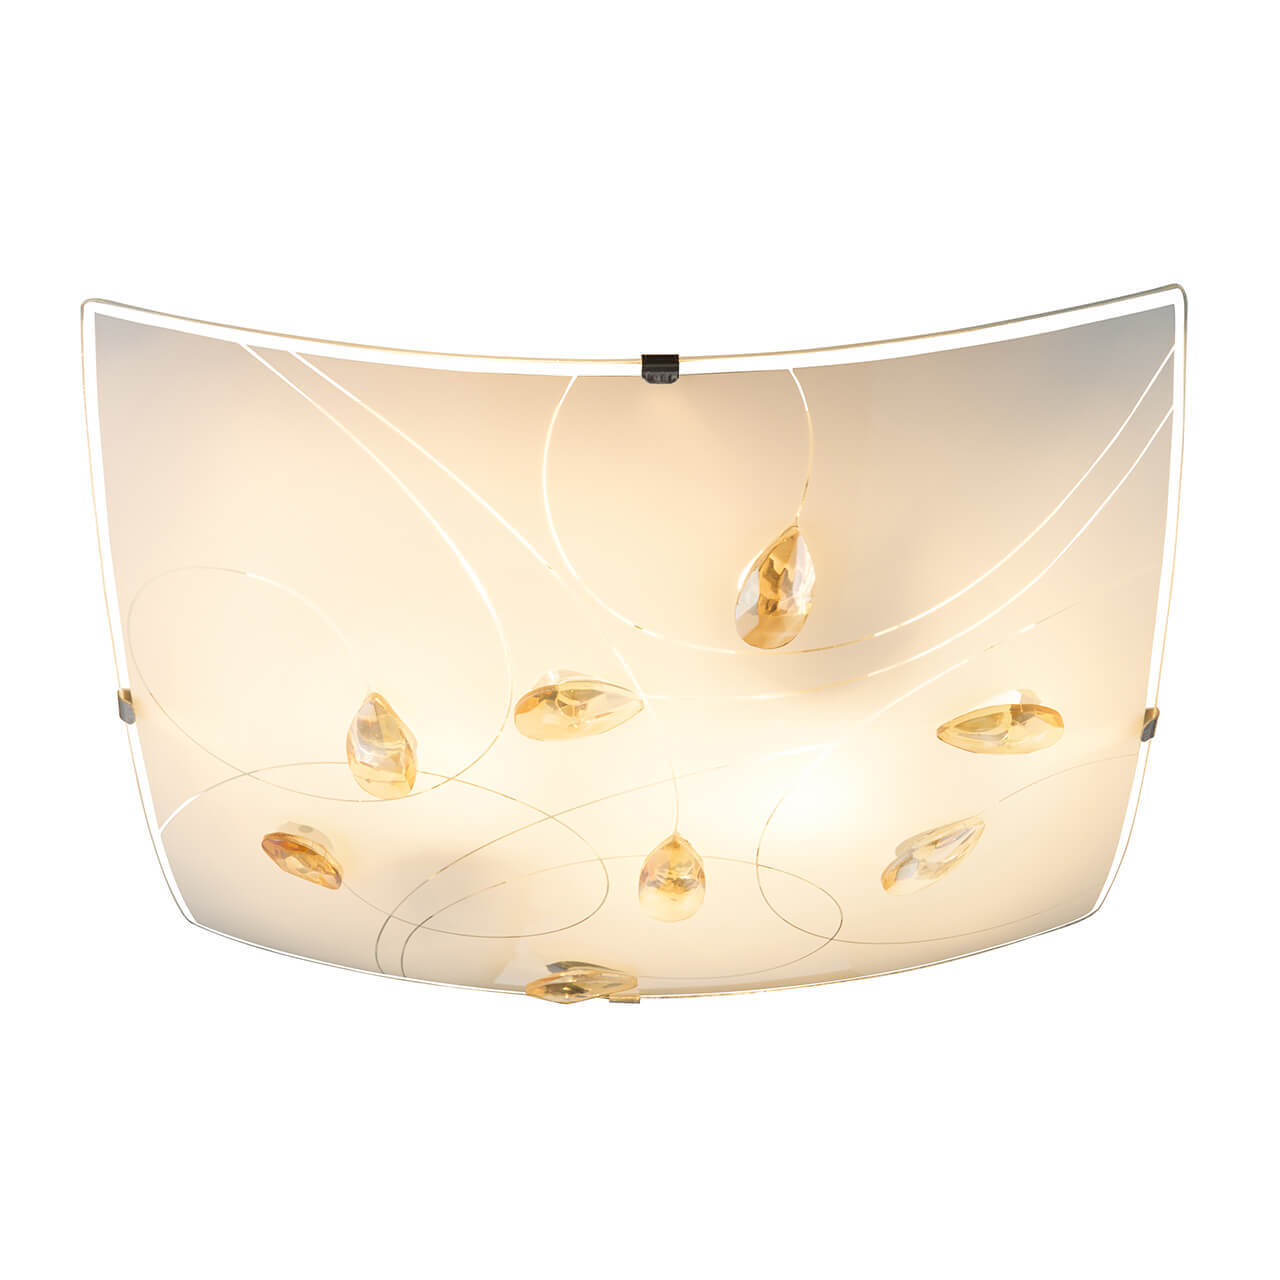 Настенно-потолочный светильник Globo Taveuni 40393 настенно потолочный светильник спот коллекция dante 57994 1 хром globo глобо